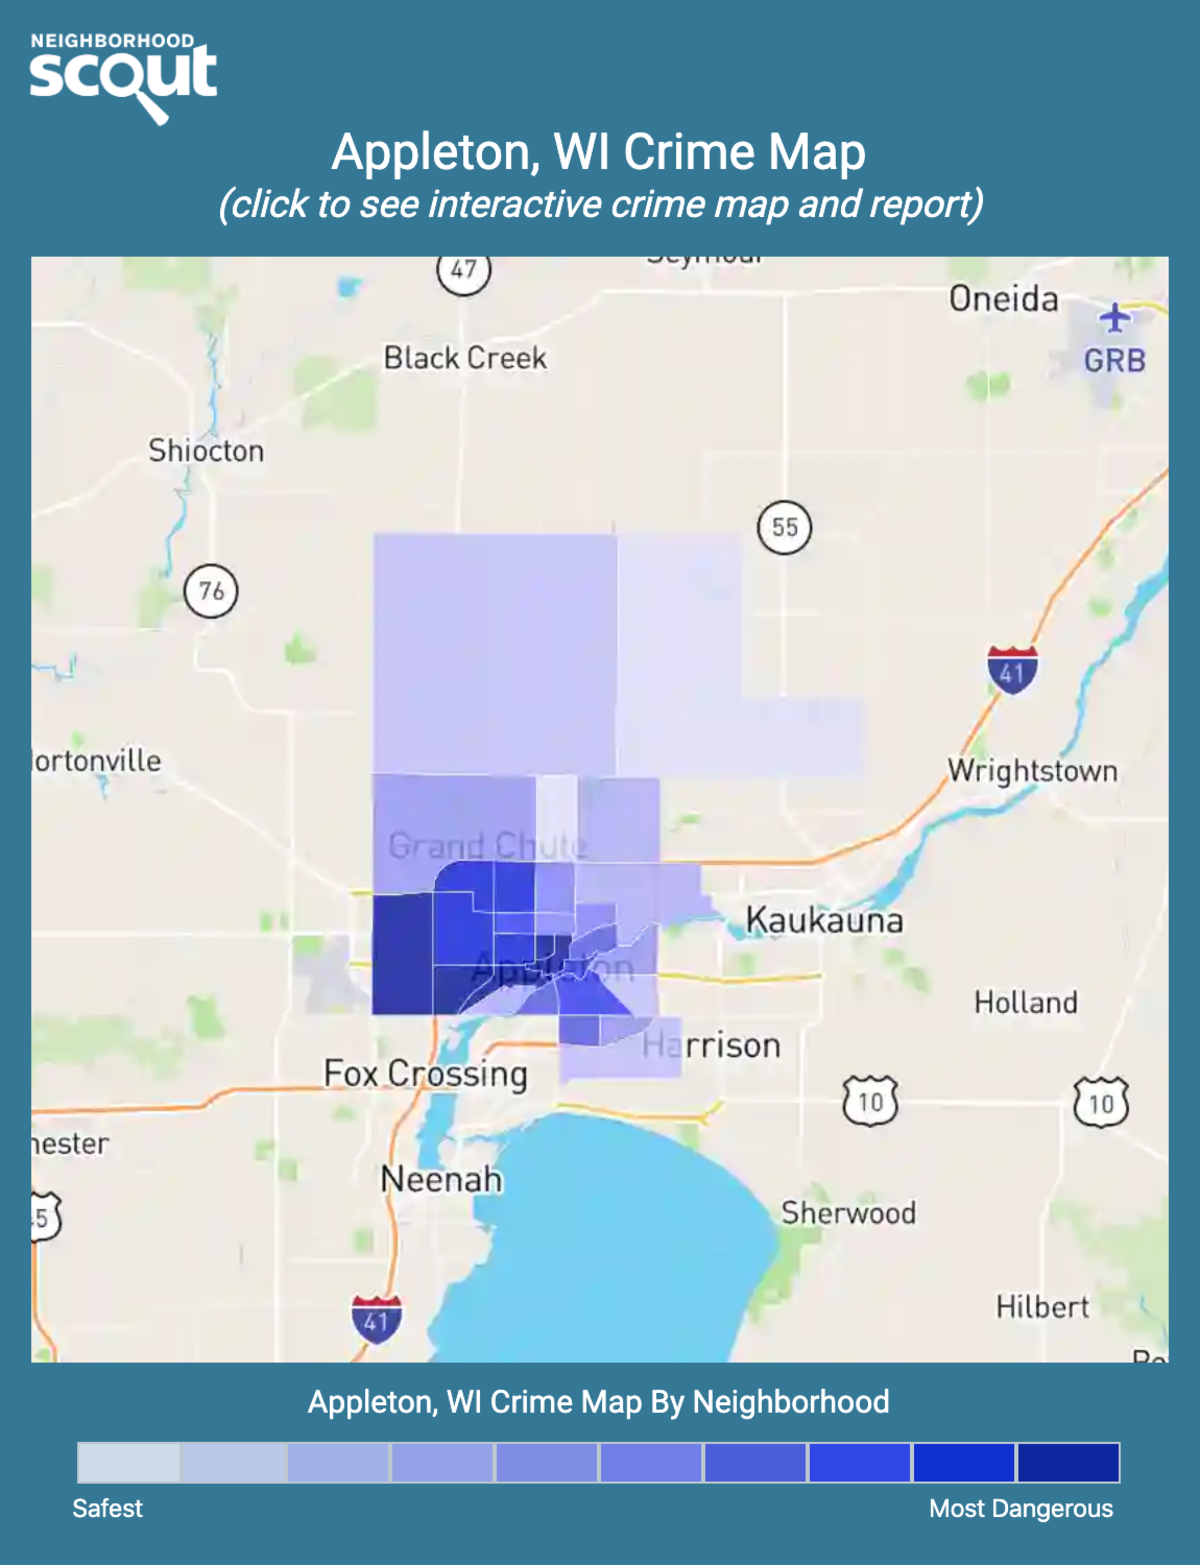 Appleton, Wisconsin crime map